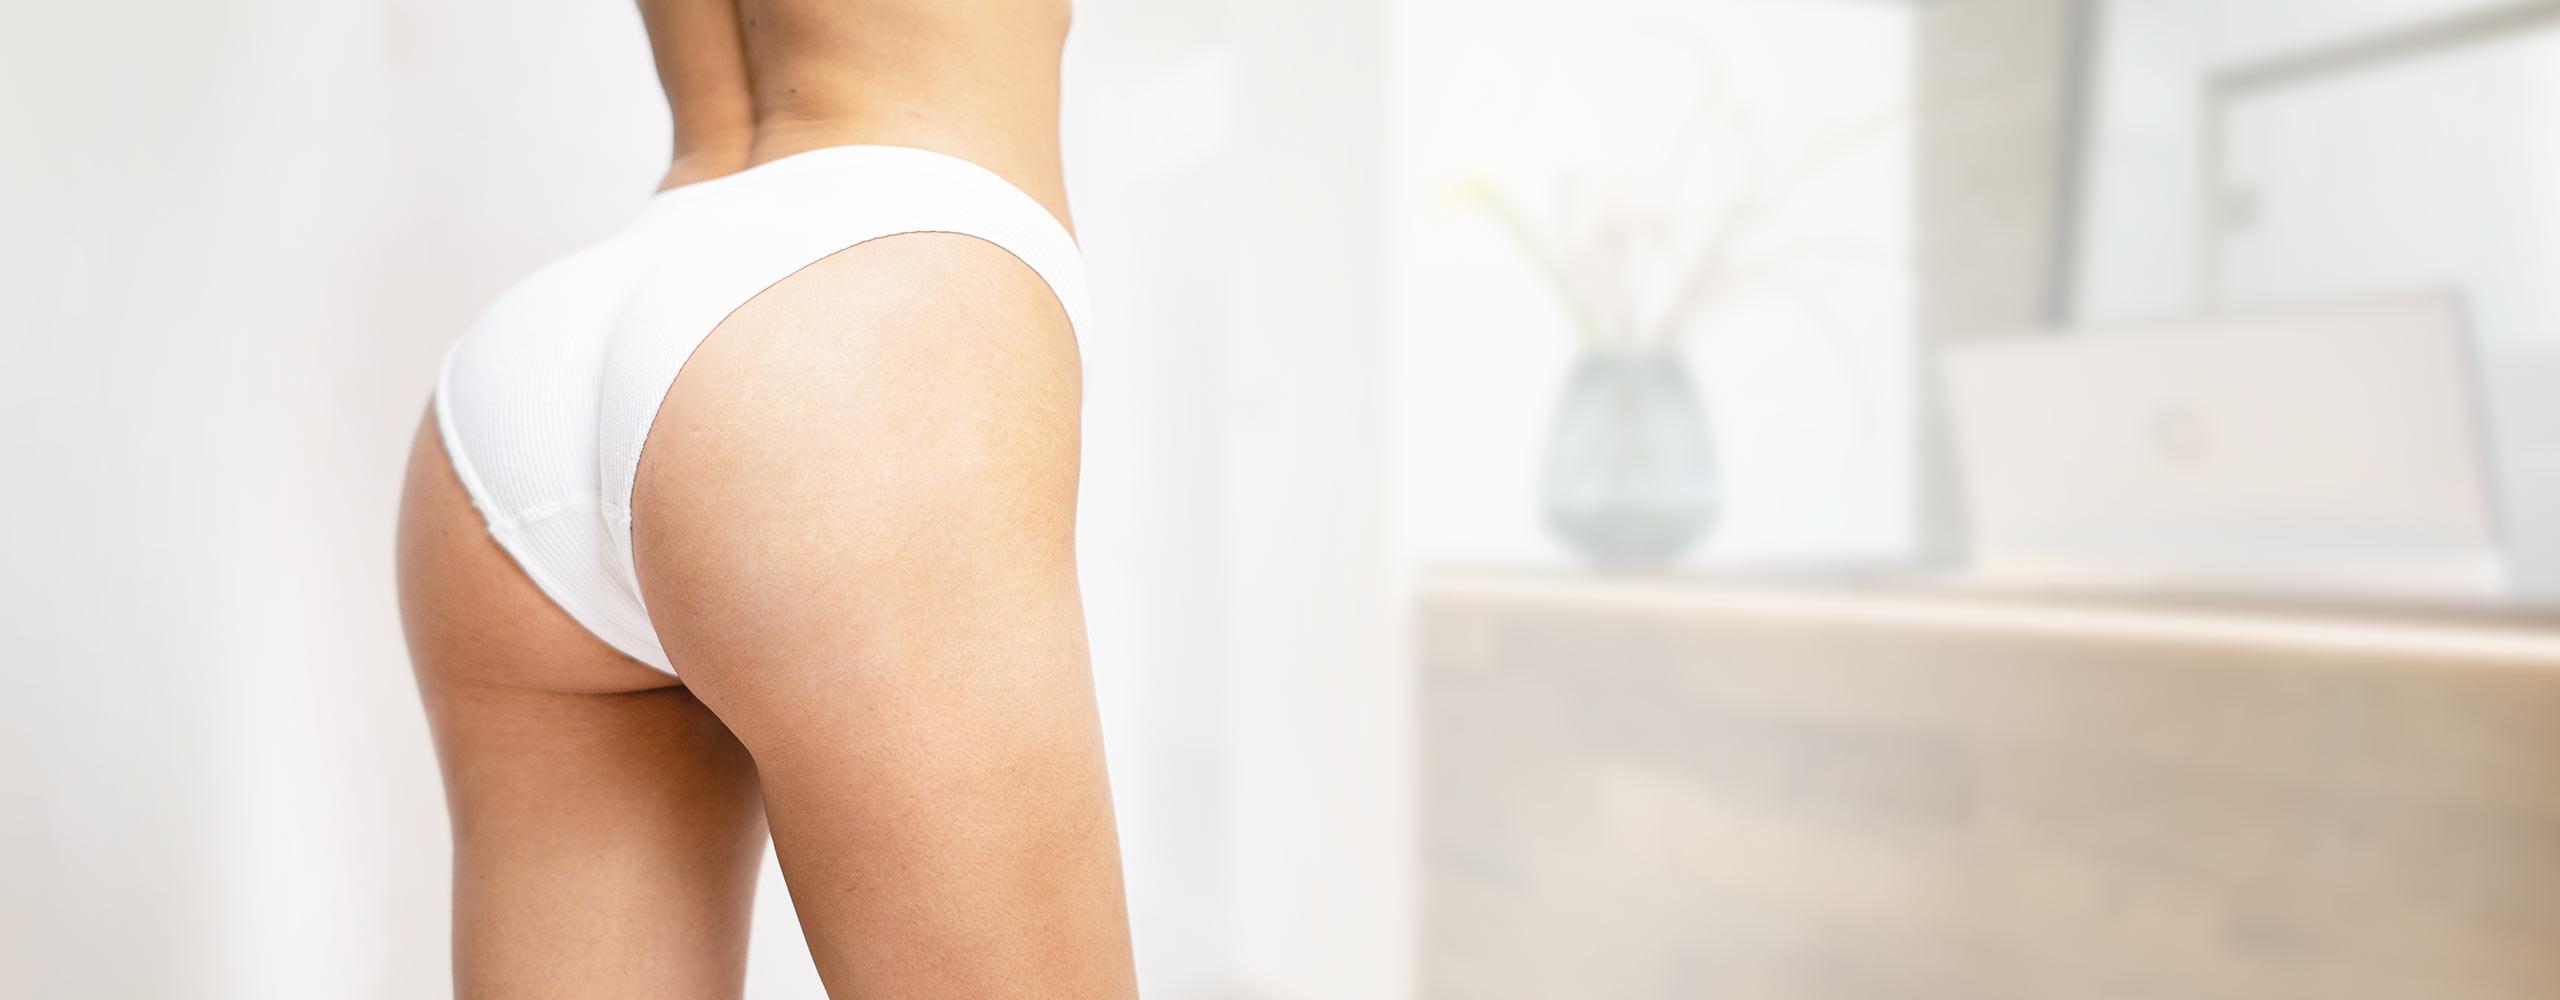 brazilian butt lift schoenheitsklinik proaesthetic header